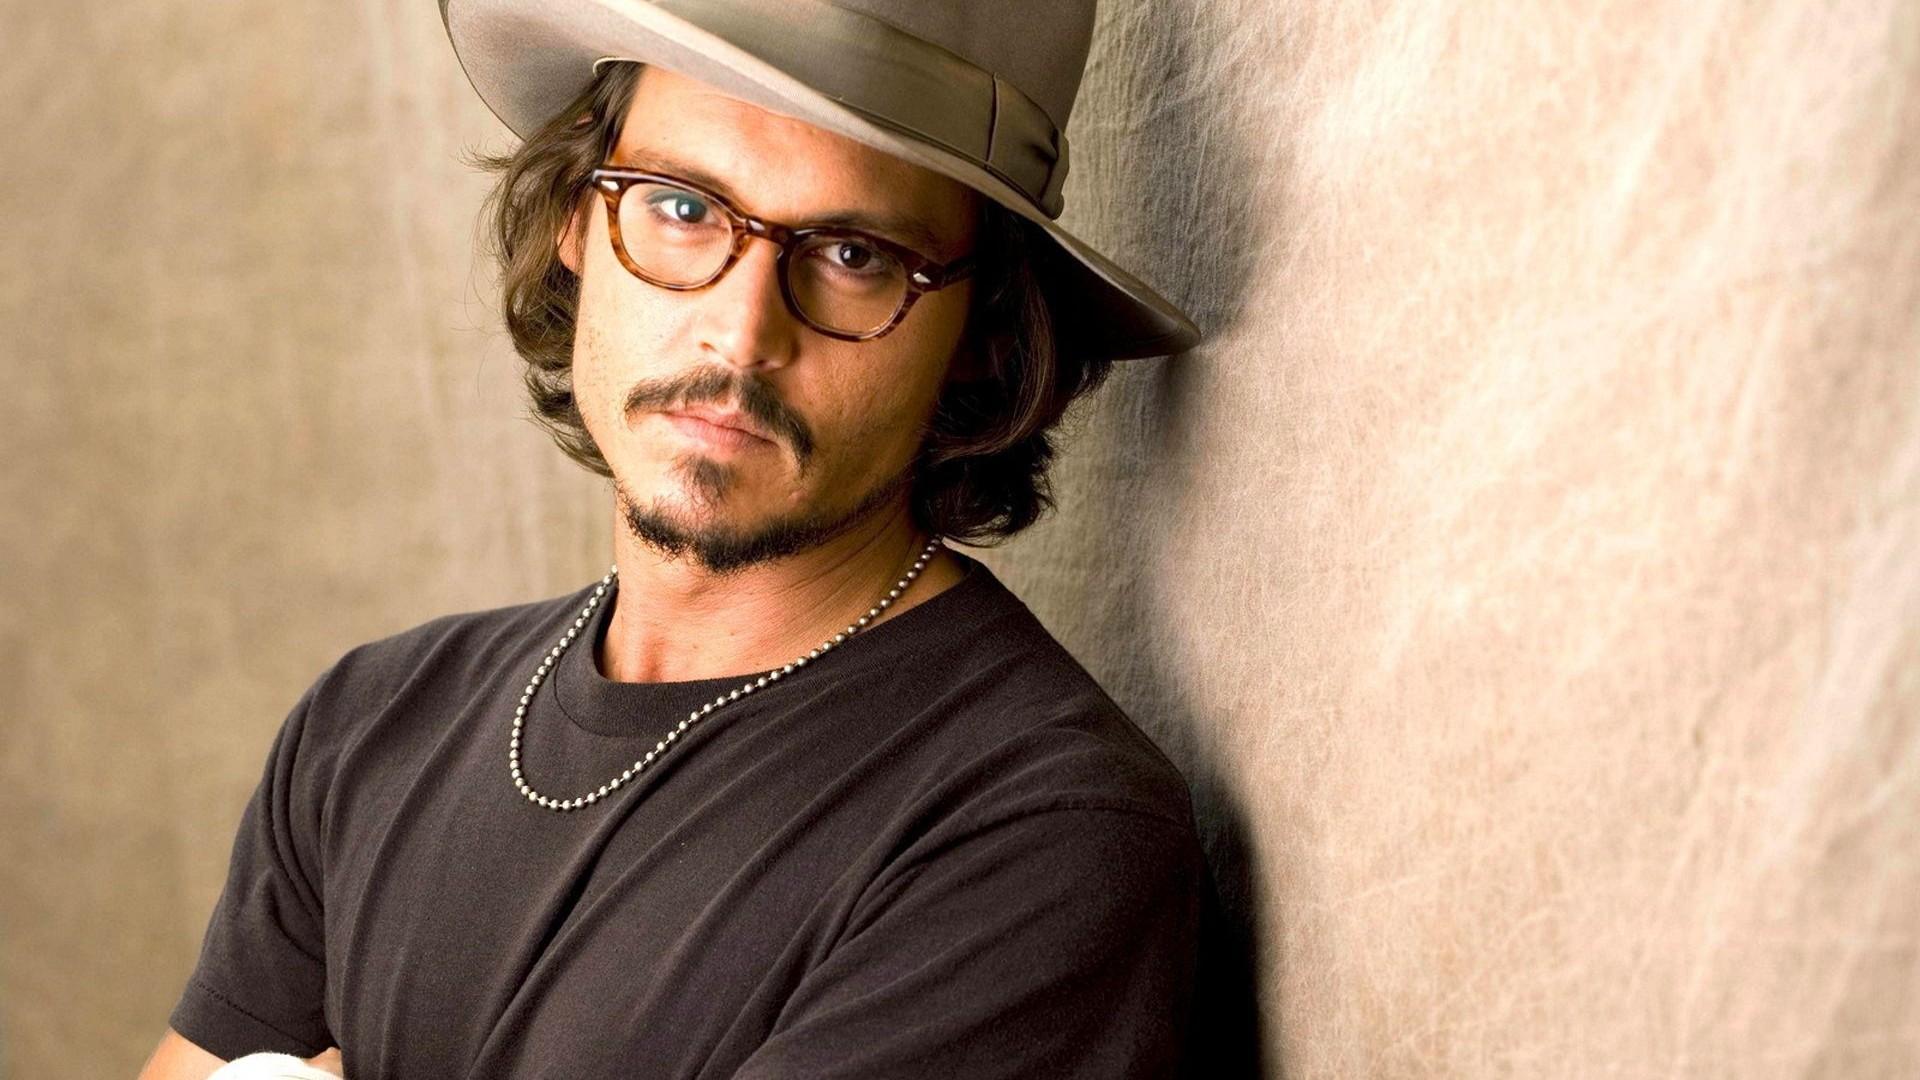 Johnny Depp pode substituir Michael Keaton em Beetlejuice 2